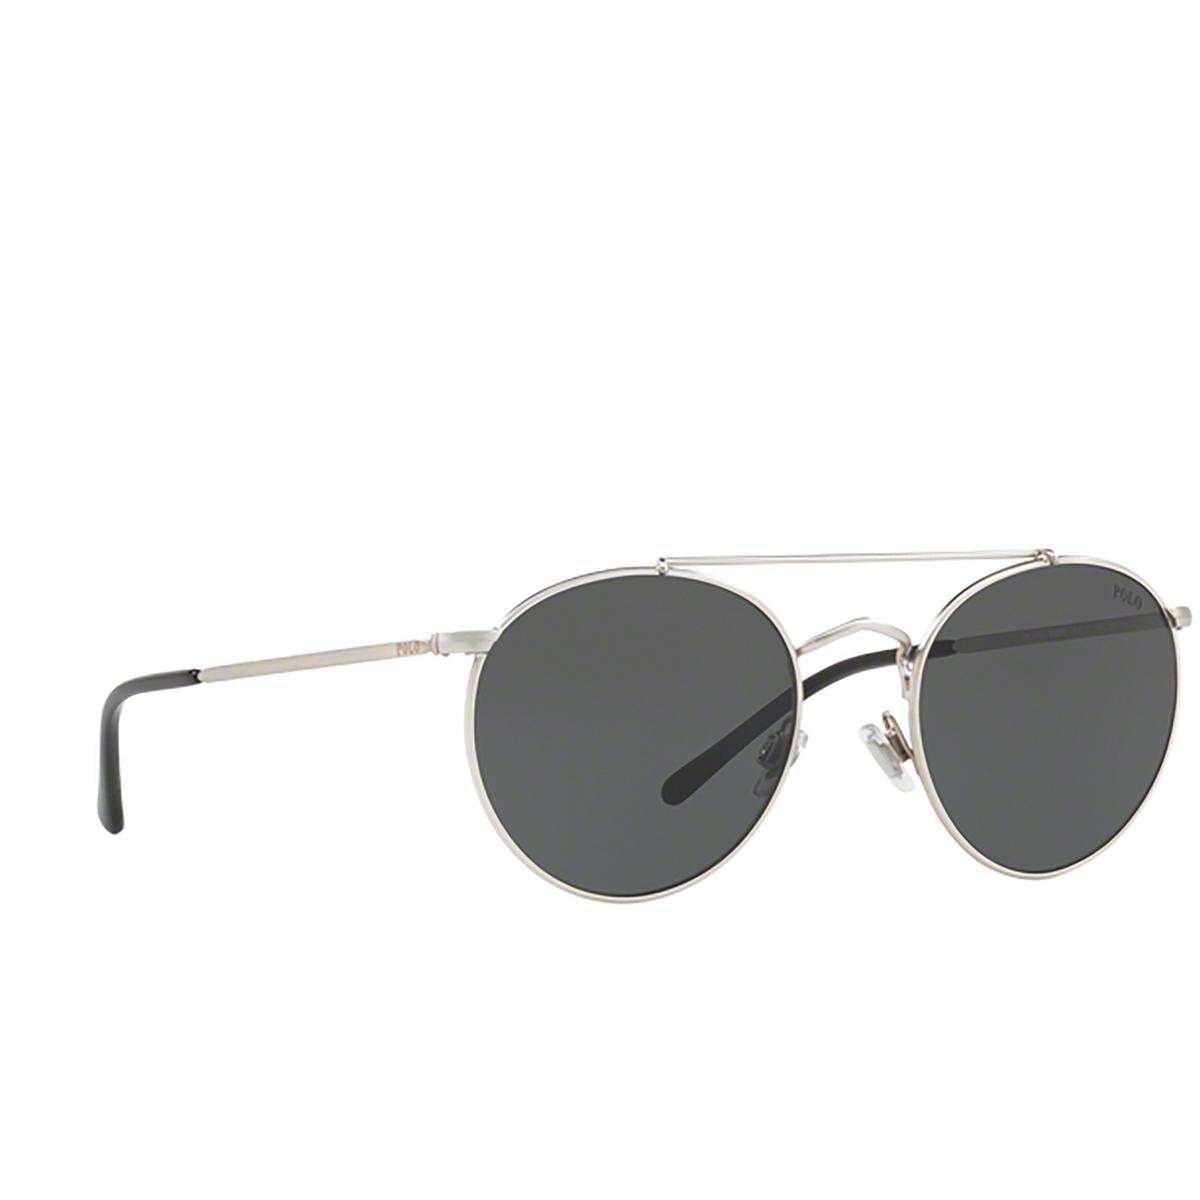 Polo Ralph Lauren® Aviator Sunglasses: PH3114 color Semishiny Brushed Silver 932687.